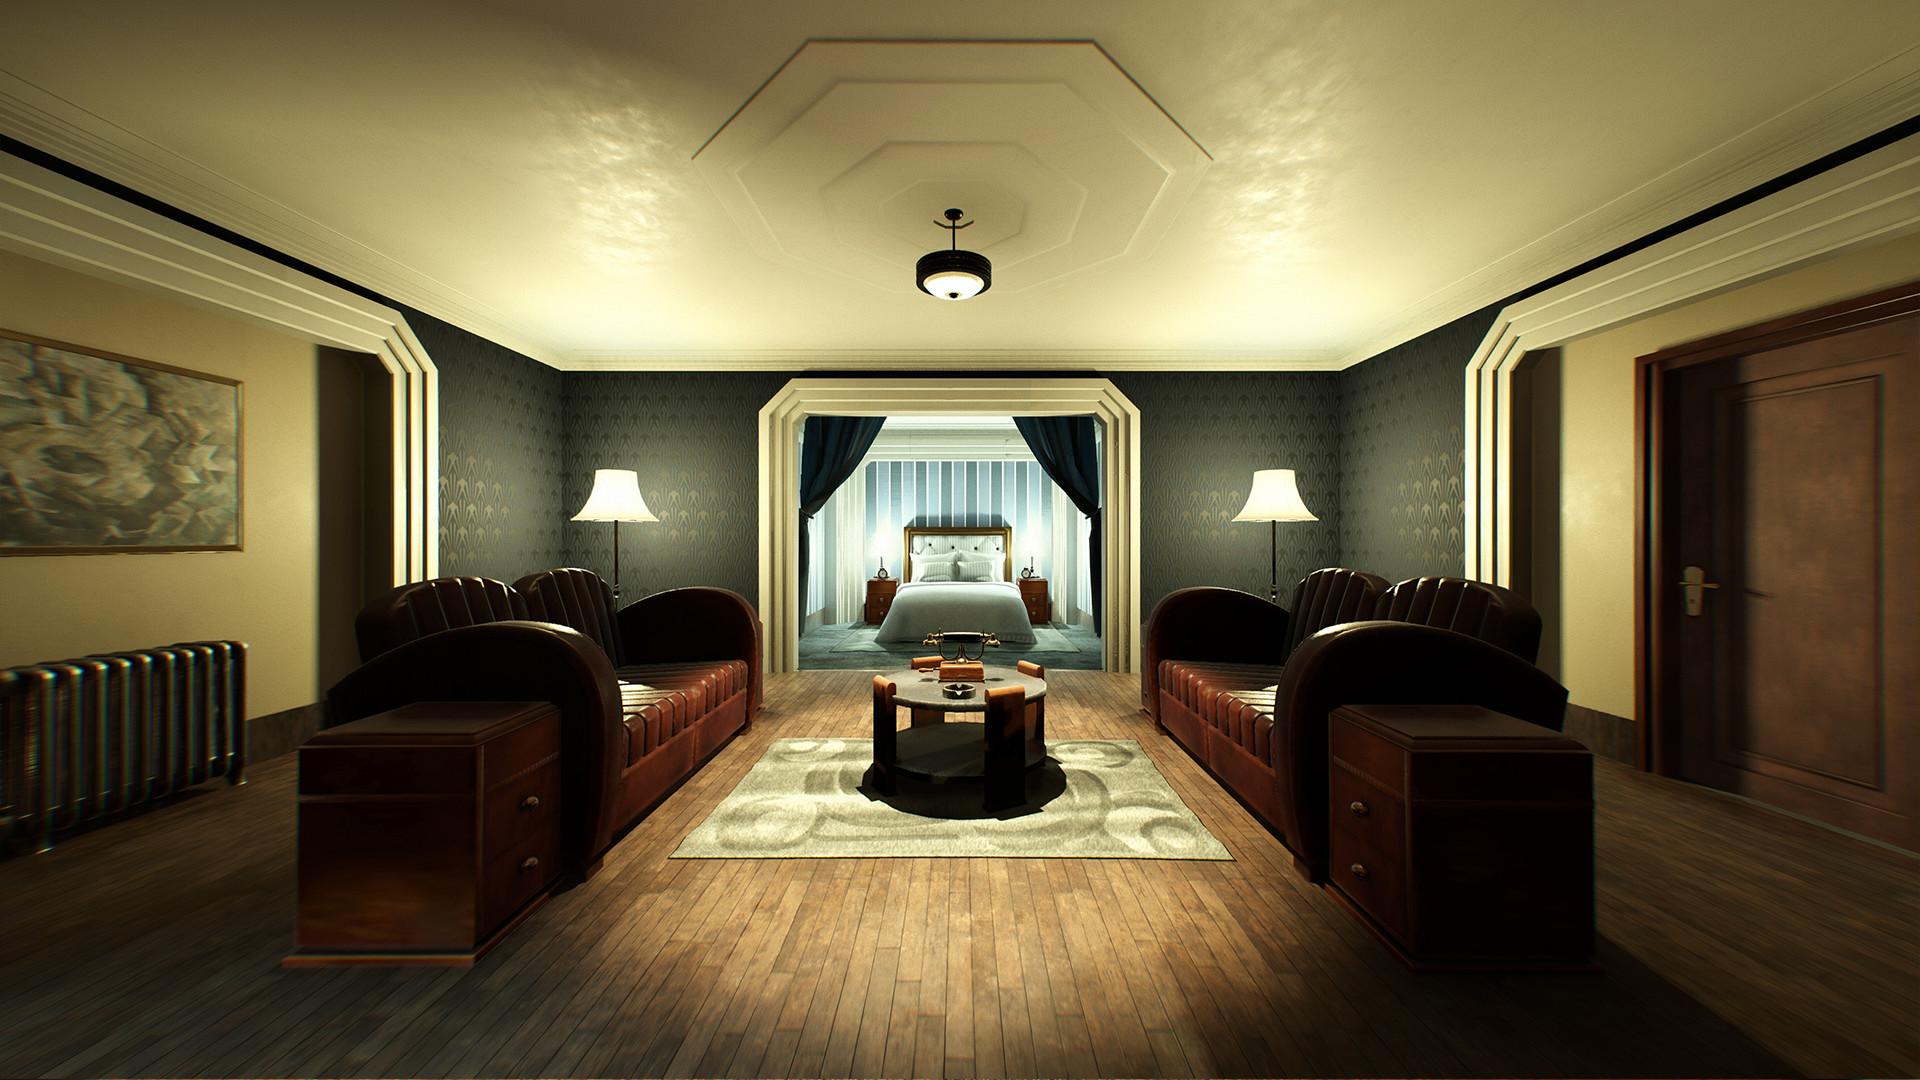 Augustin grassien bedroom 04